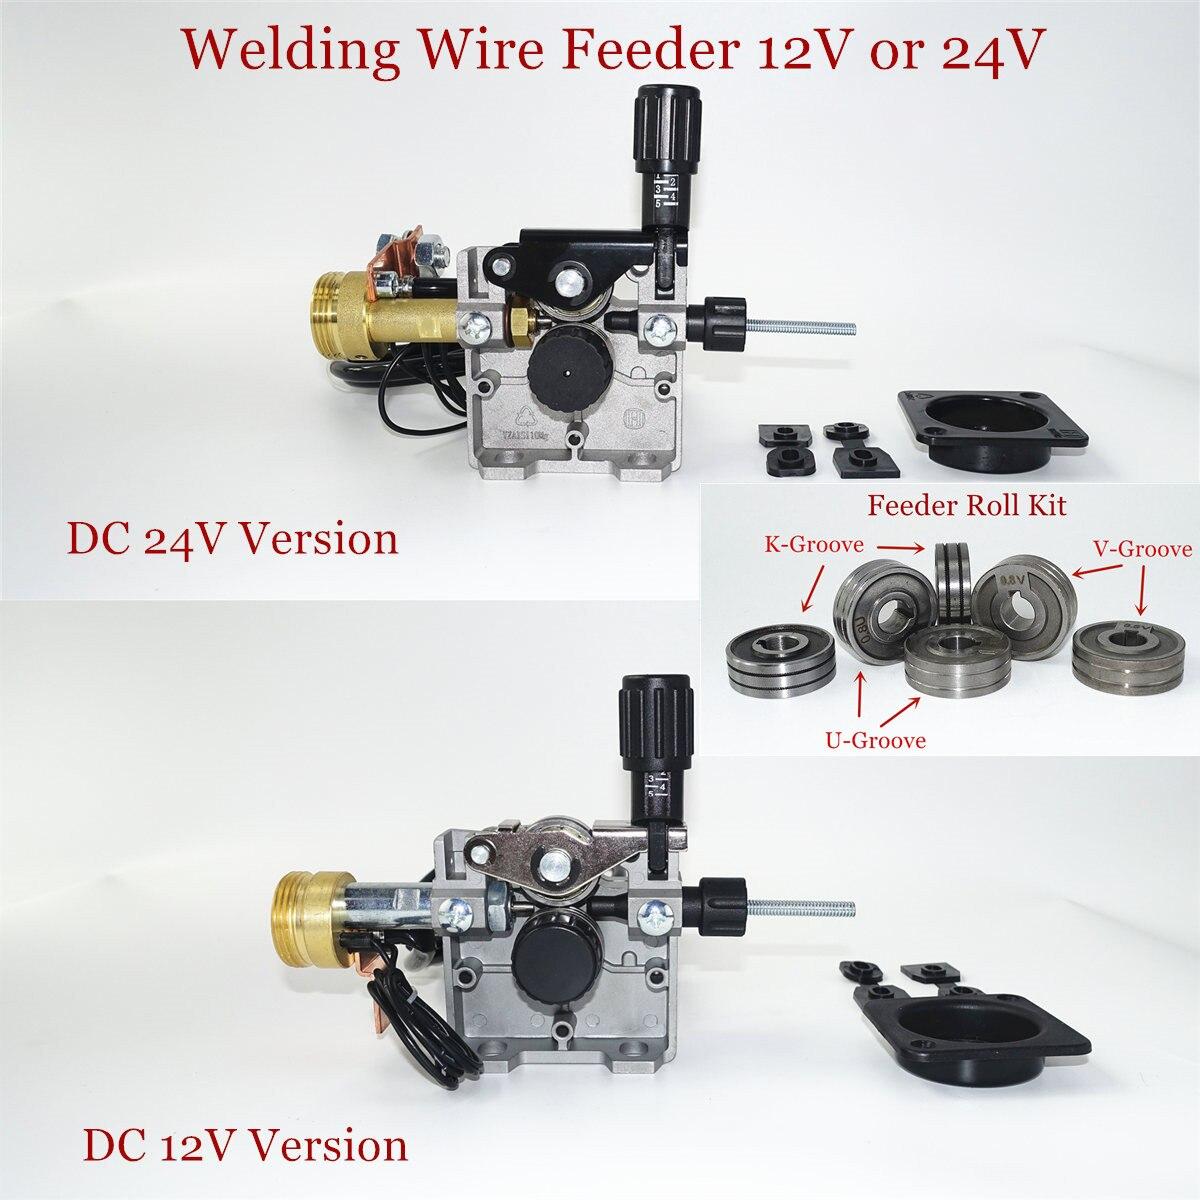 Wire Feeder DC 12V 24V SSJ-29 LRS-775 Feeder Roll U V K Groove EU Socket for Steel Aluminum Flux Cored Wire MIG Welding Machine